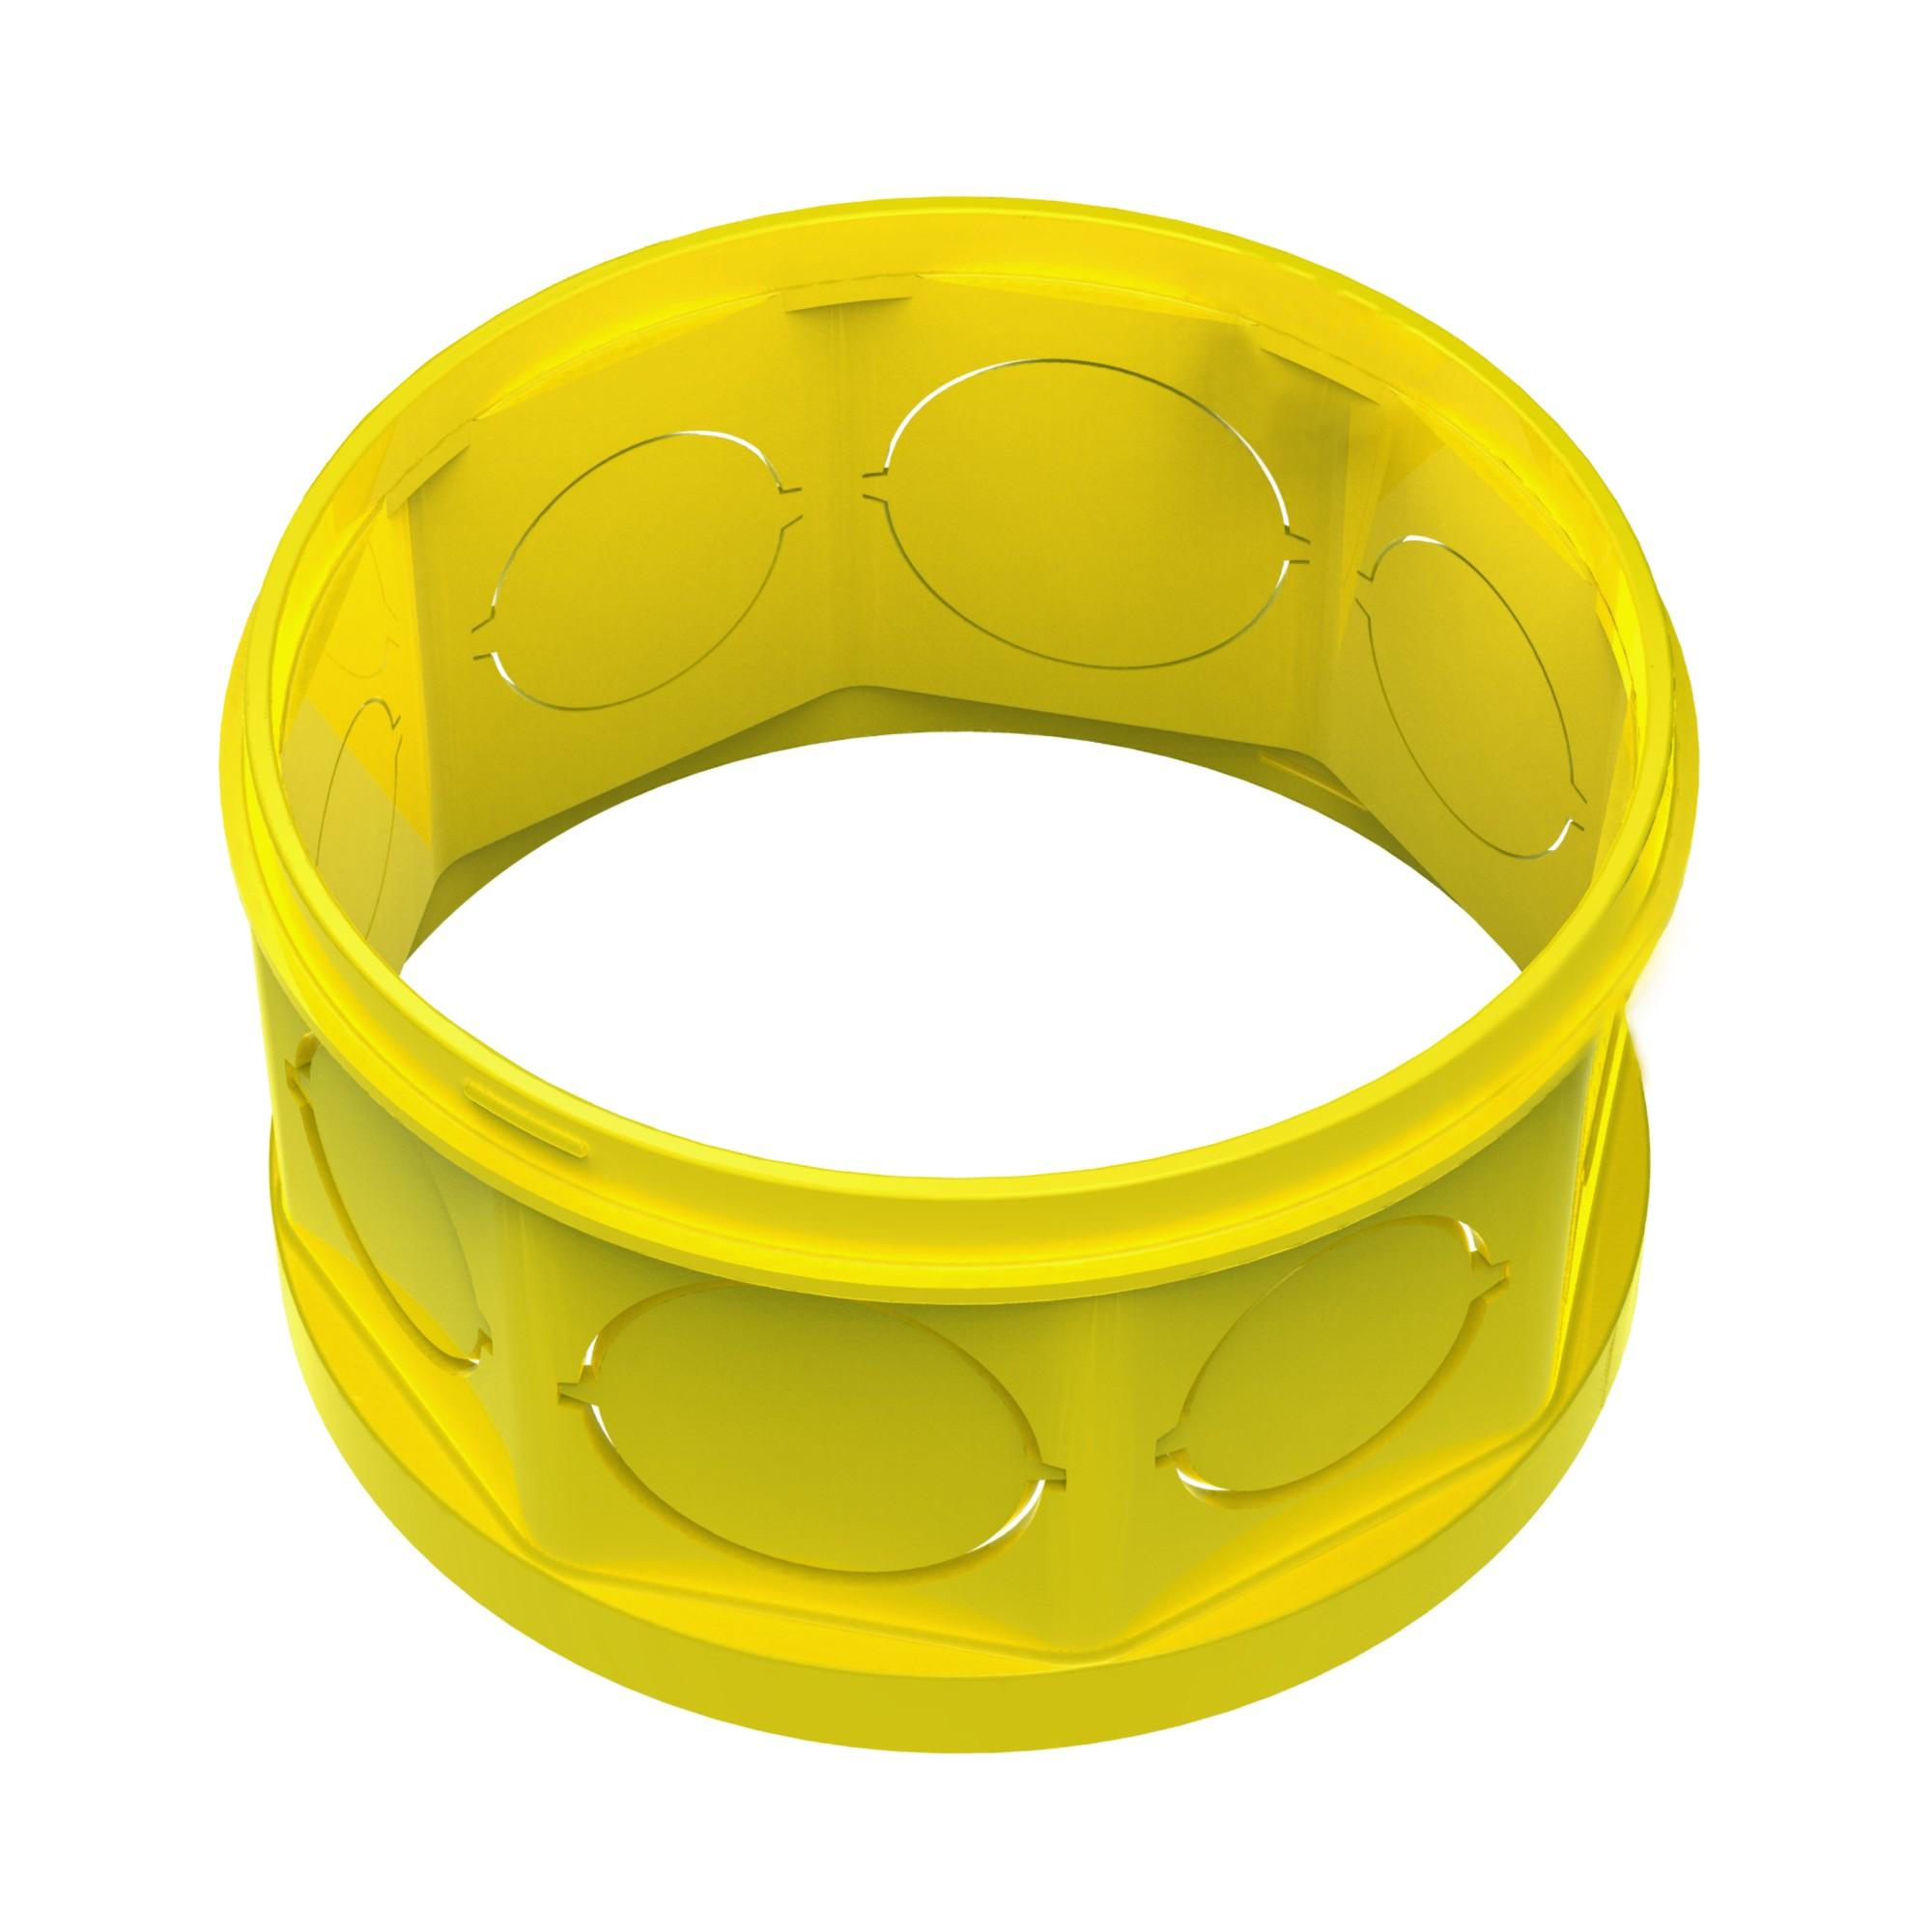 Prolongador 4X4 Octogonal Amarelo Tigreflex - Tigre